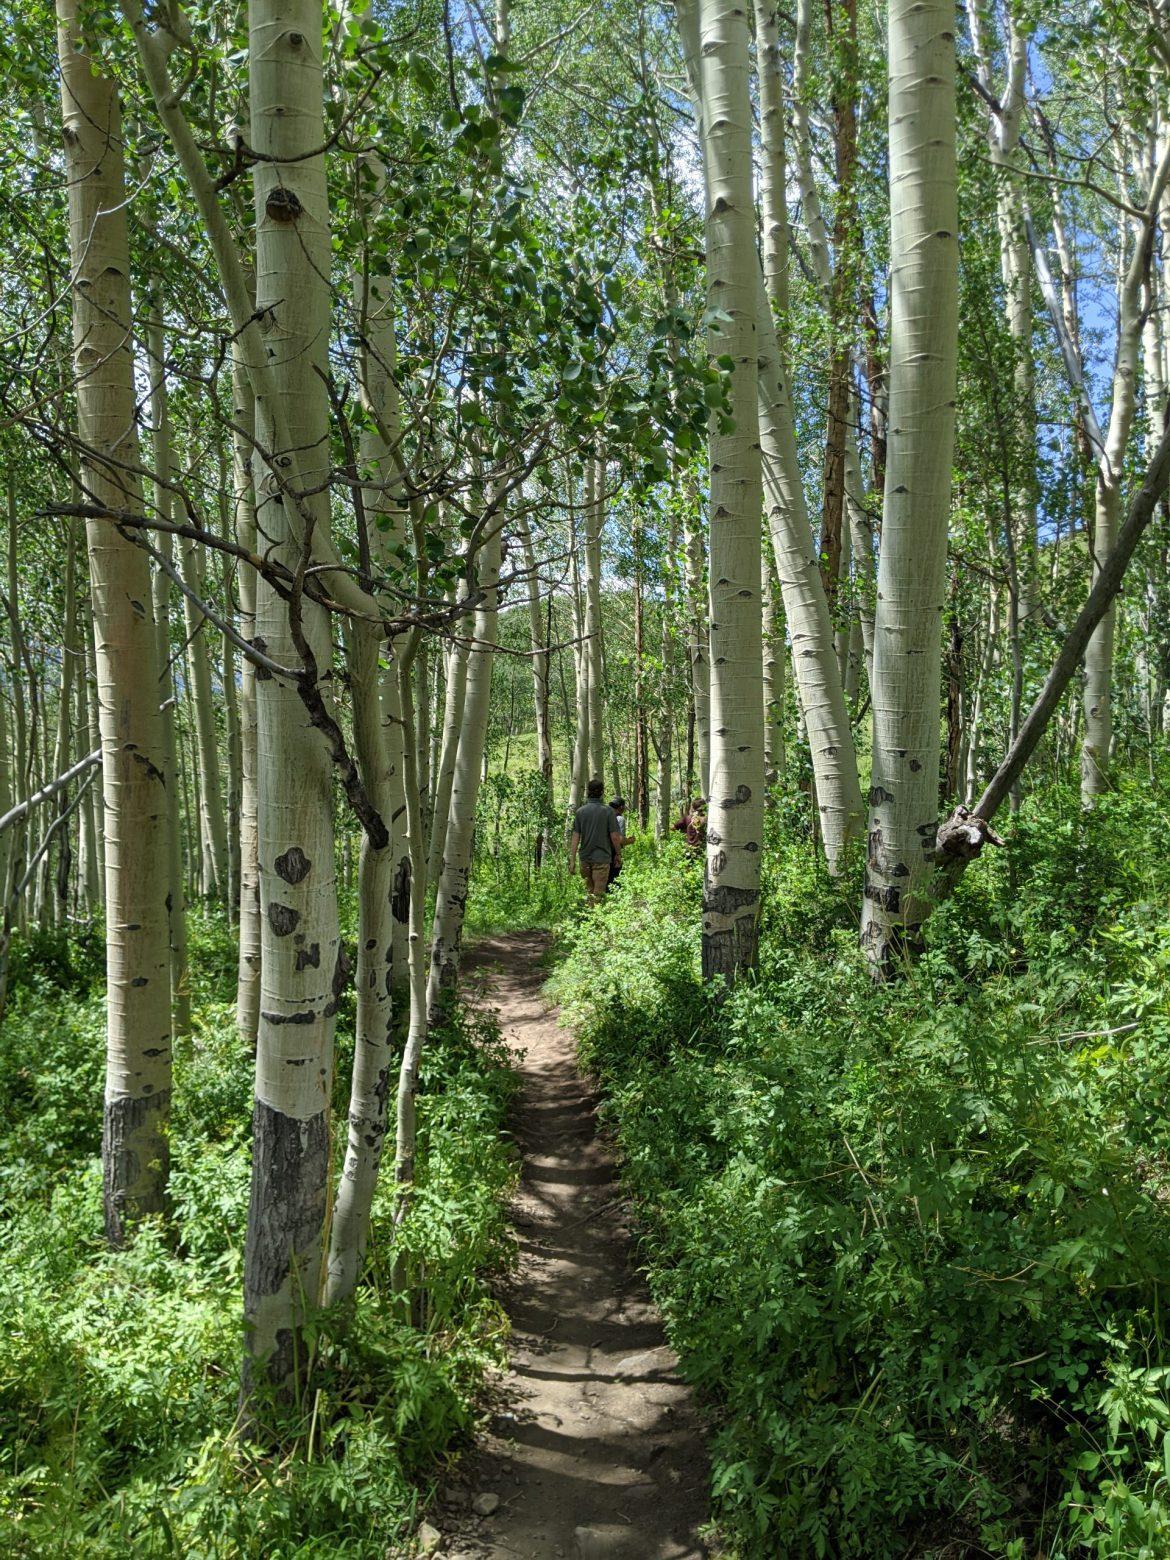 Aspen Grove near Crested Butte